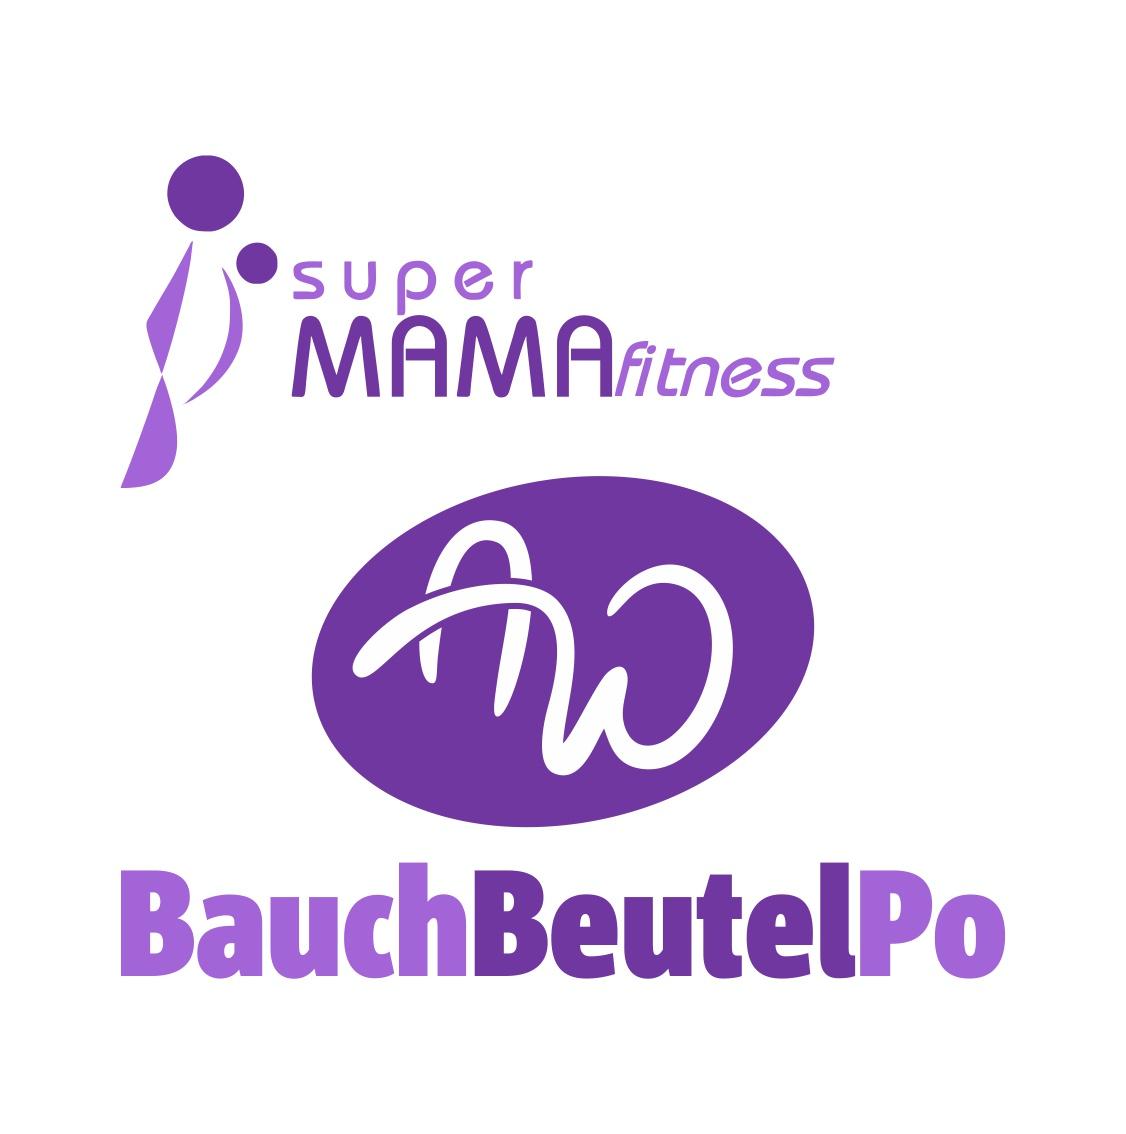 BauchBeutelPo